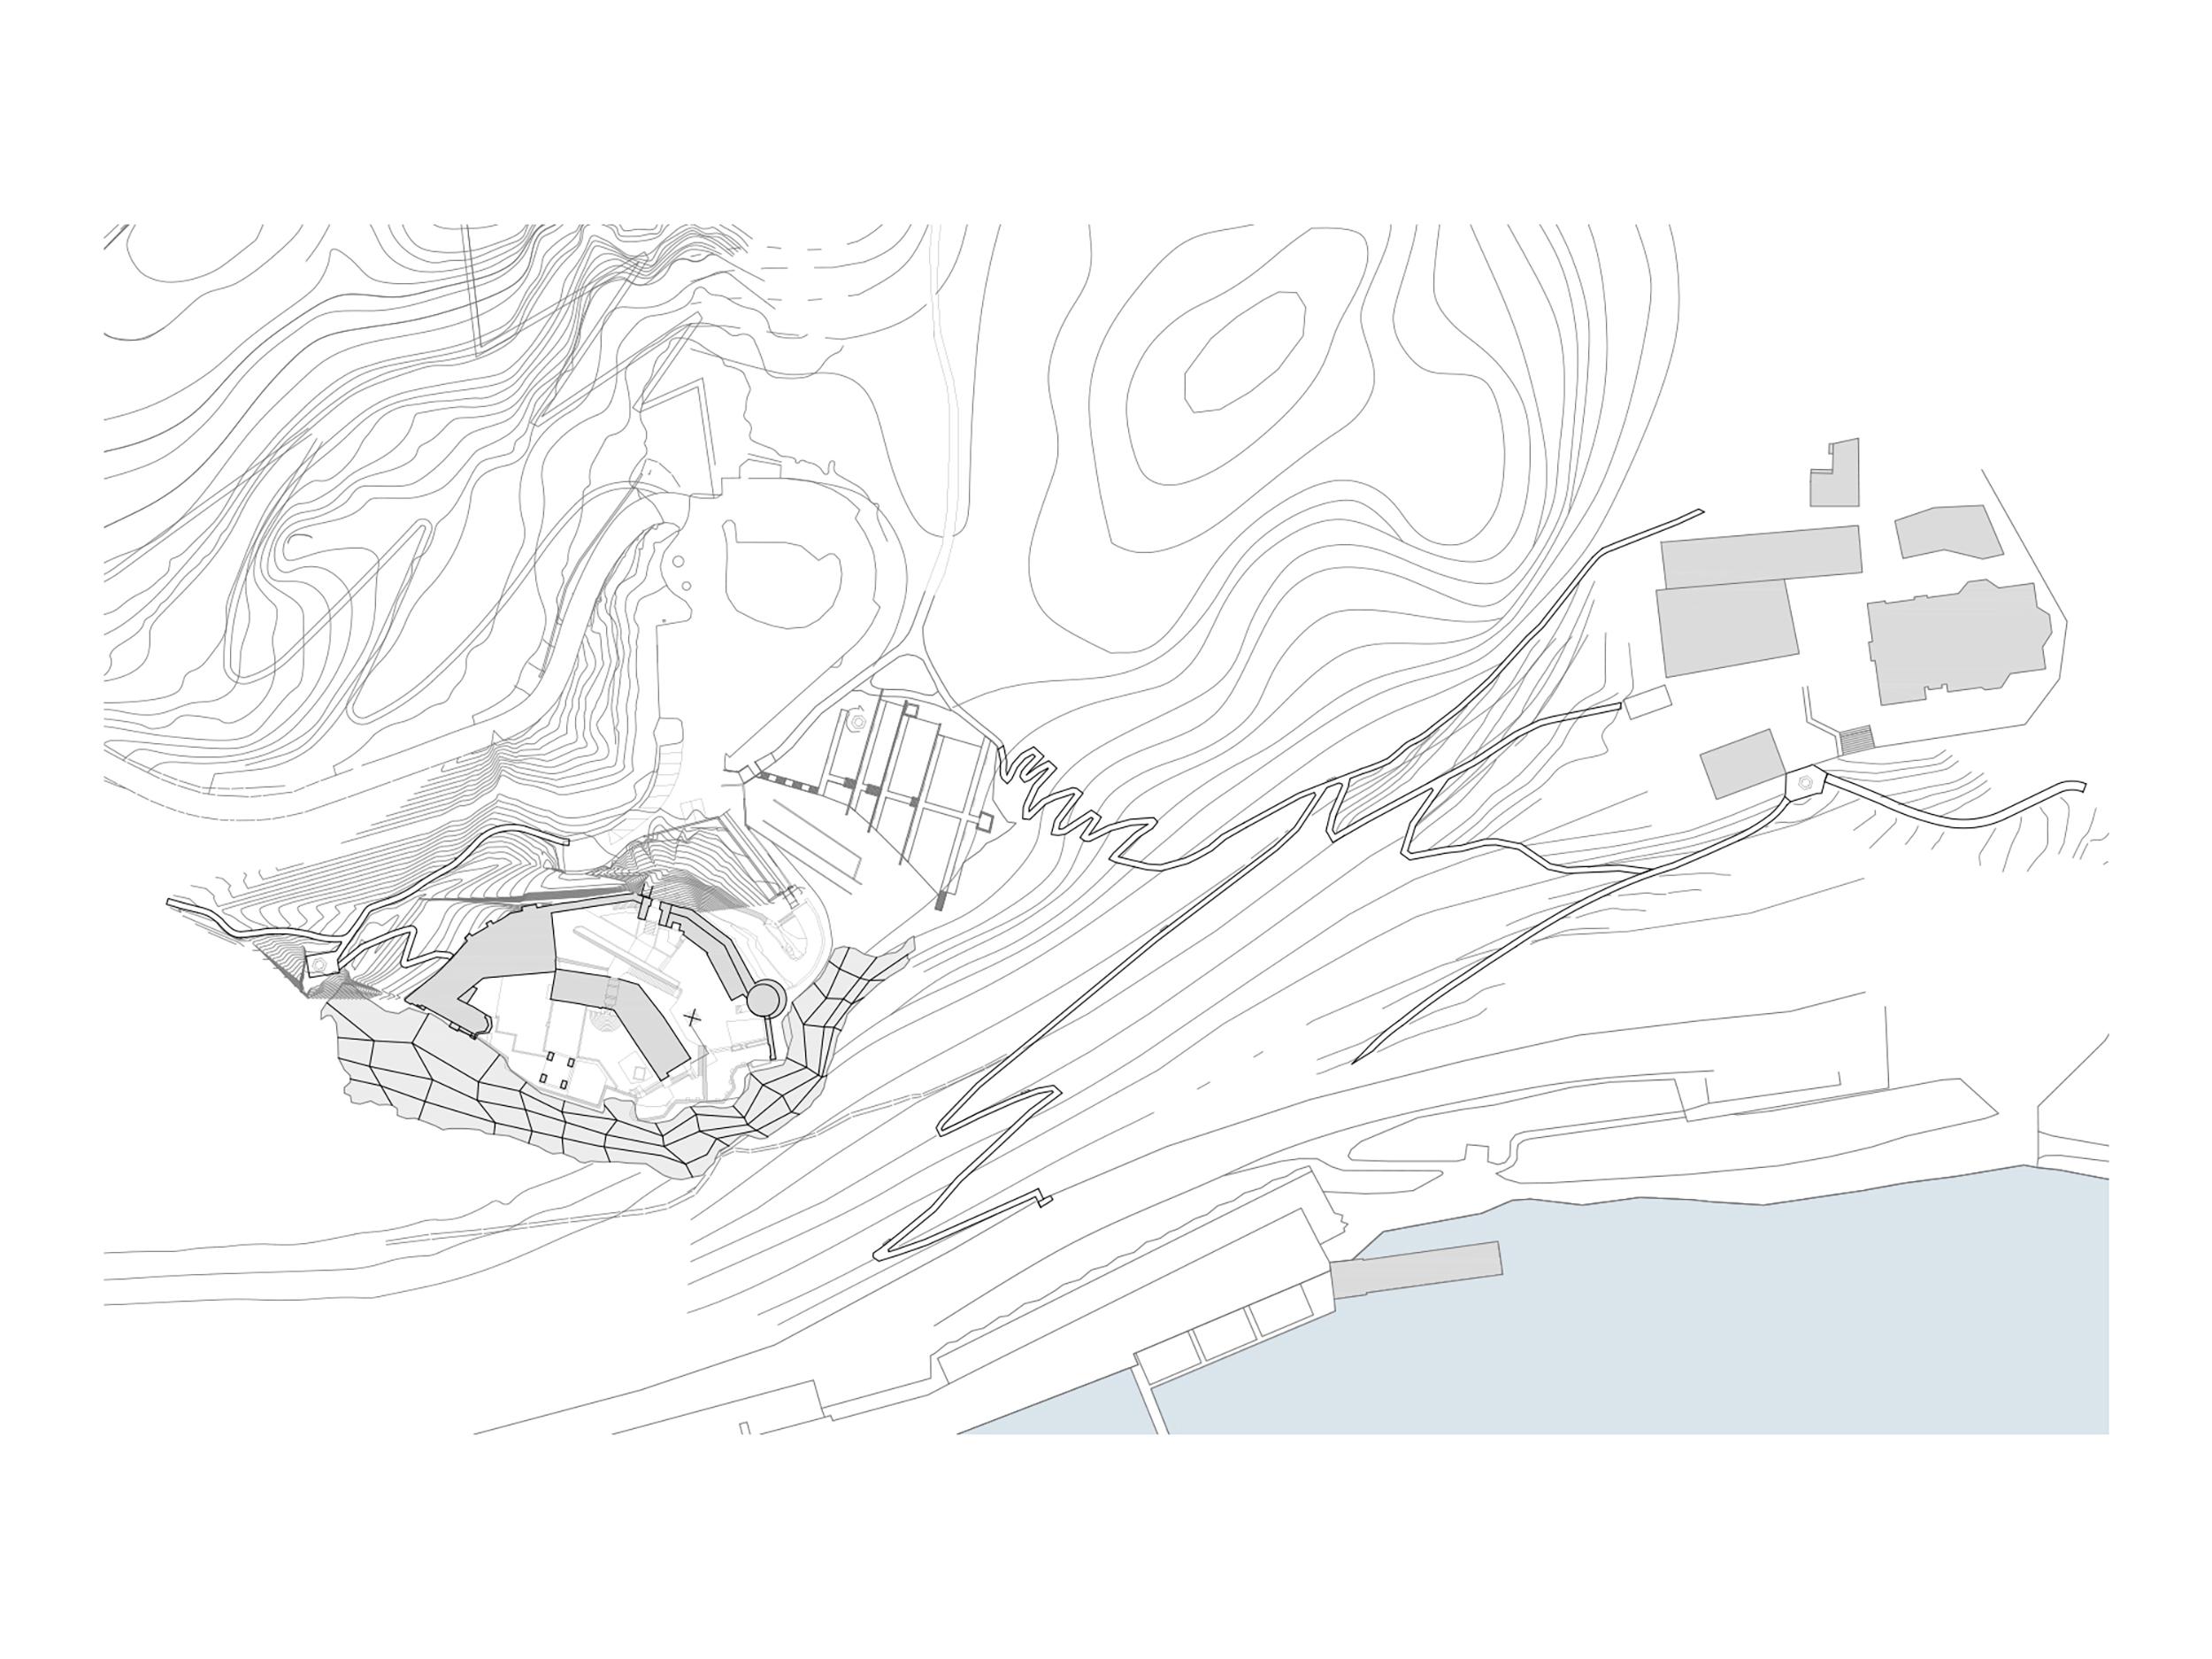 bruto bled pot na grad jezero castle lake path stairs stopnice tloris plan